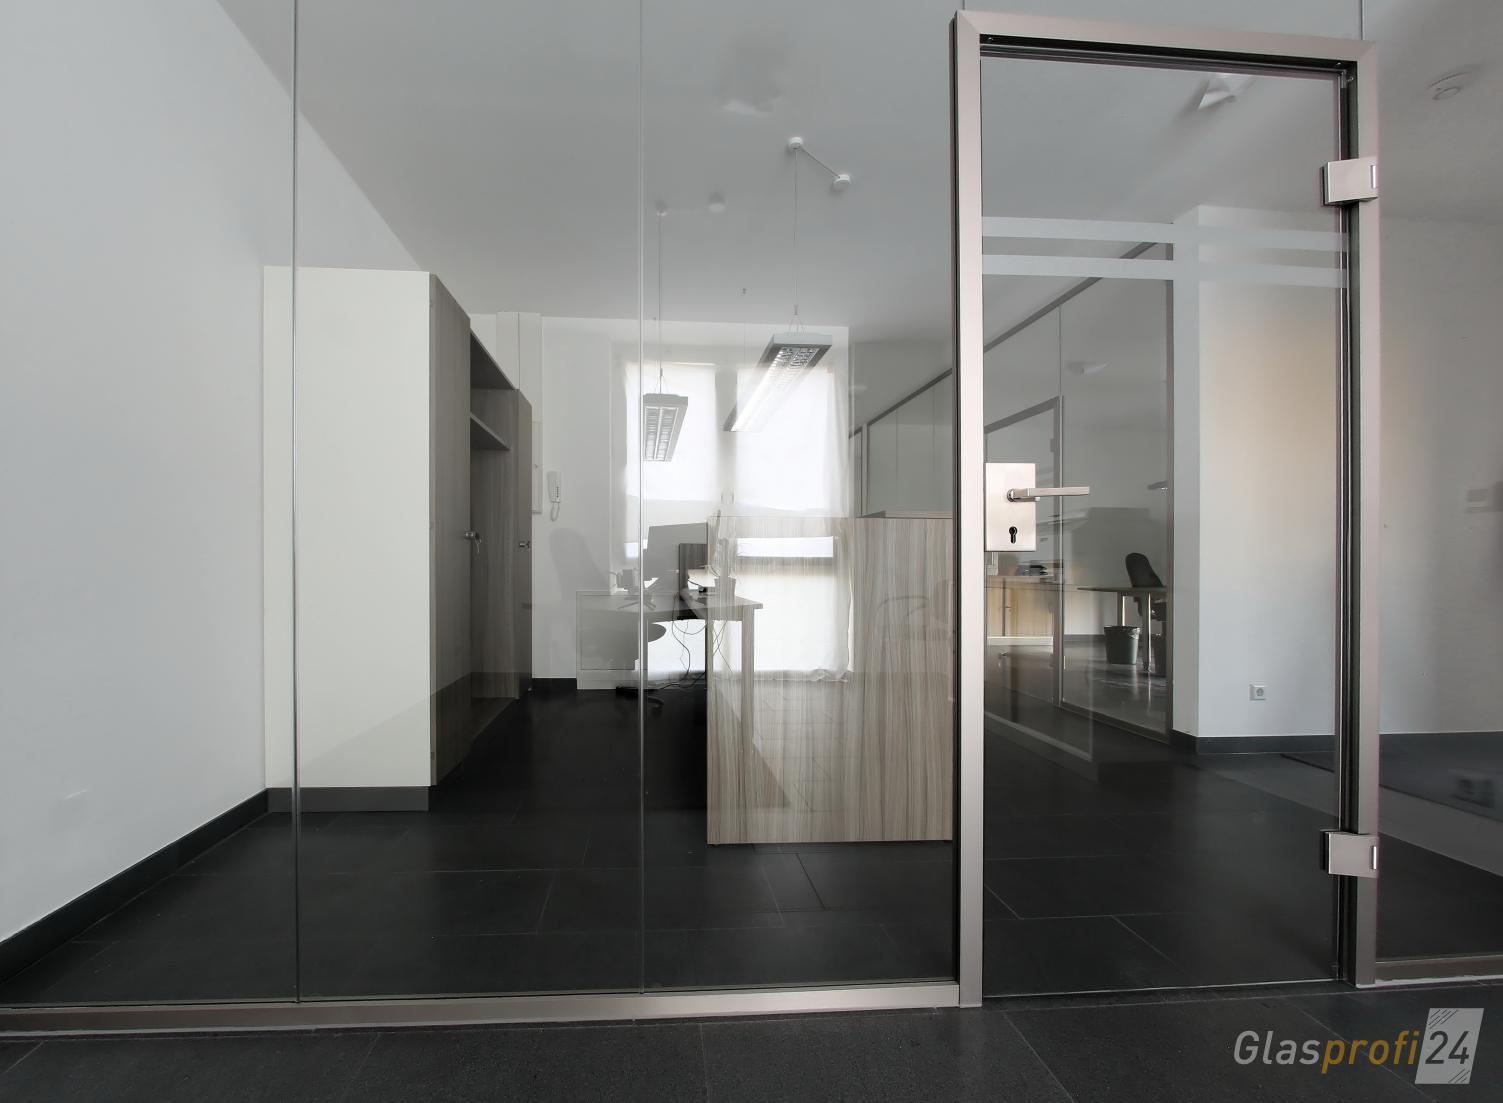 b rotrennwand aus glas mit t r glasprofi24. Black Bedroom Furniture Sets. Home Design Ideas